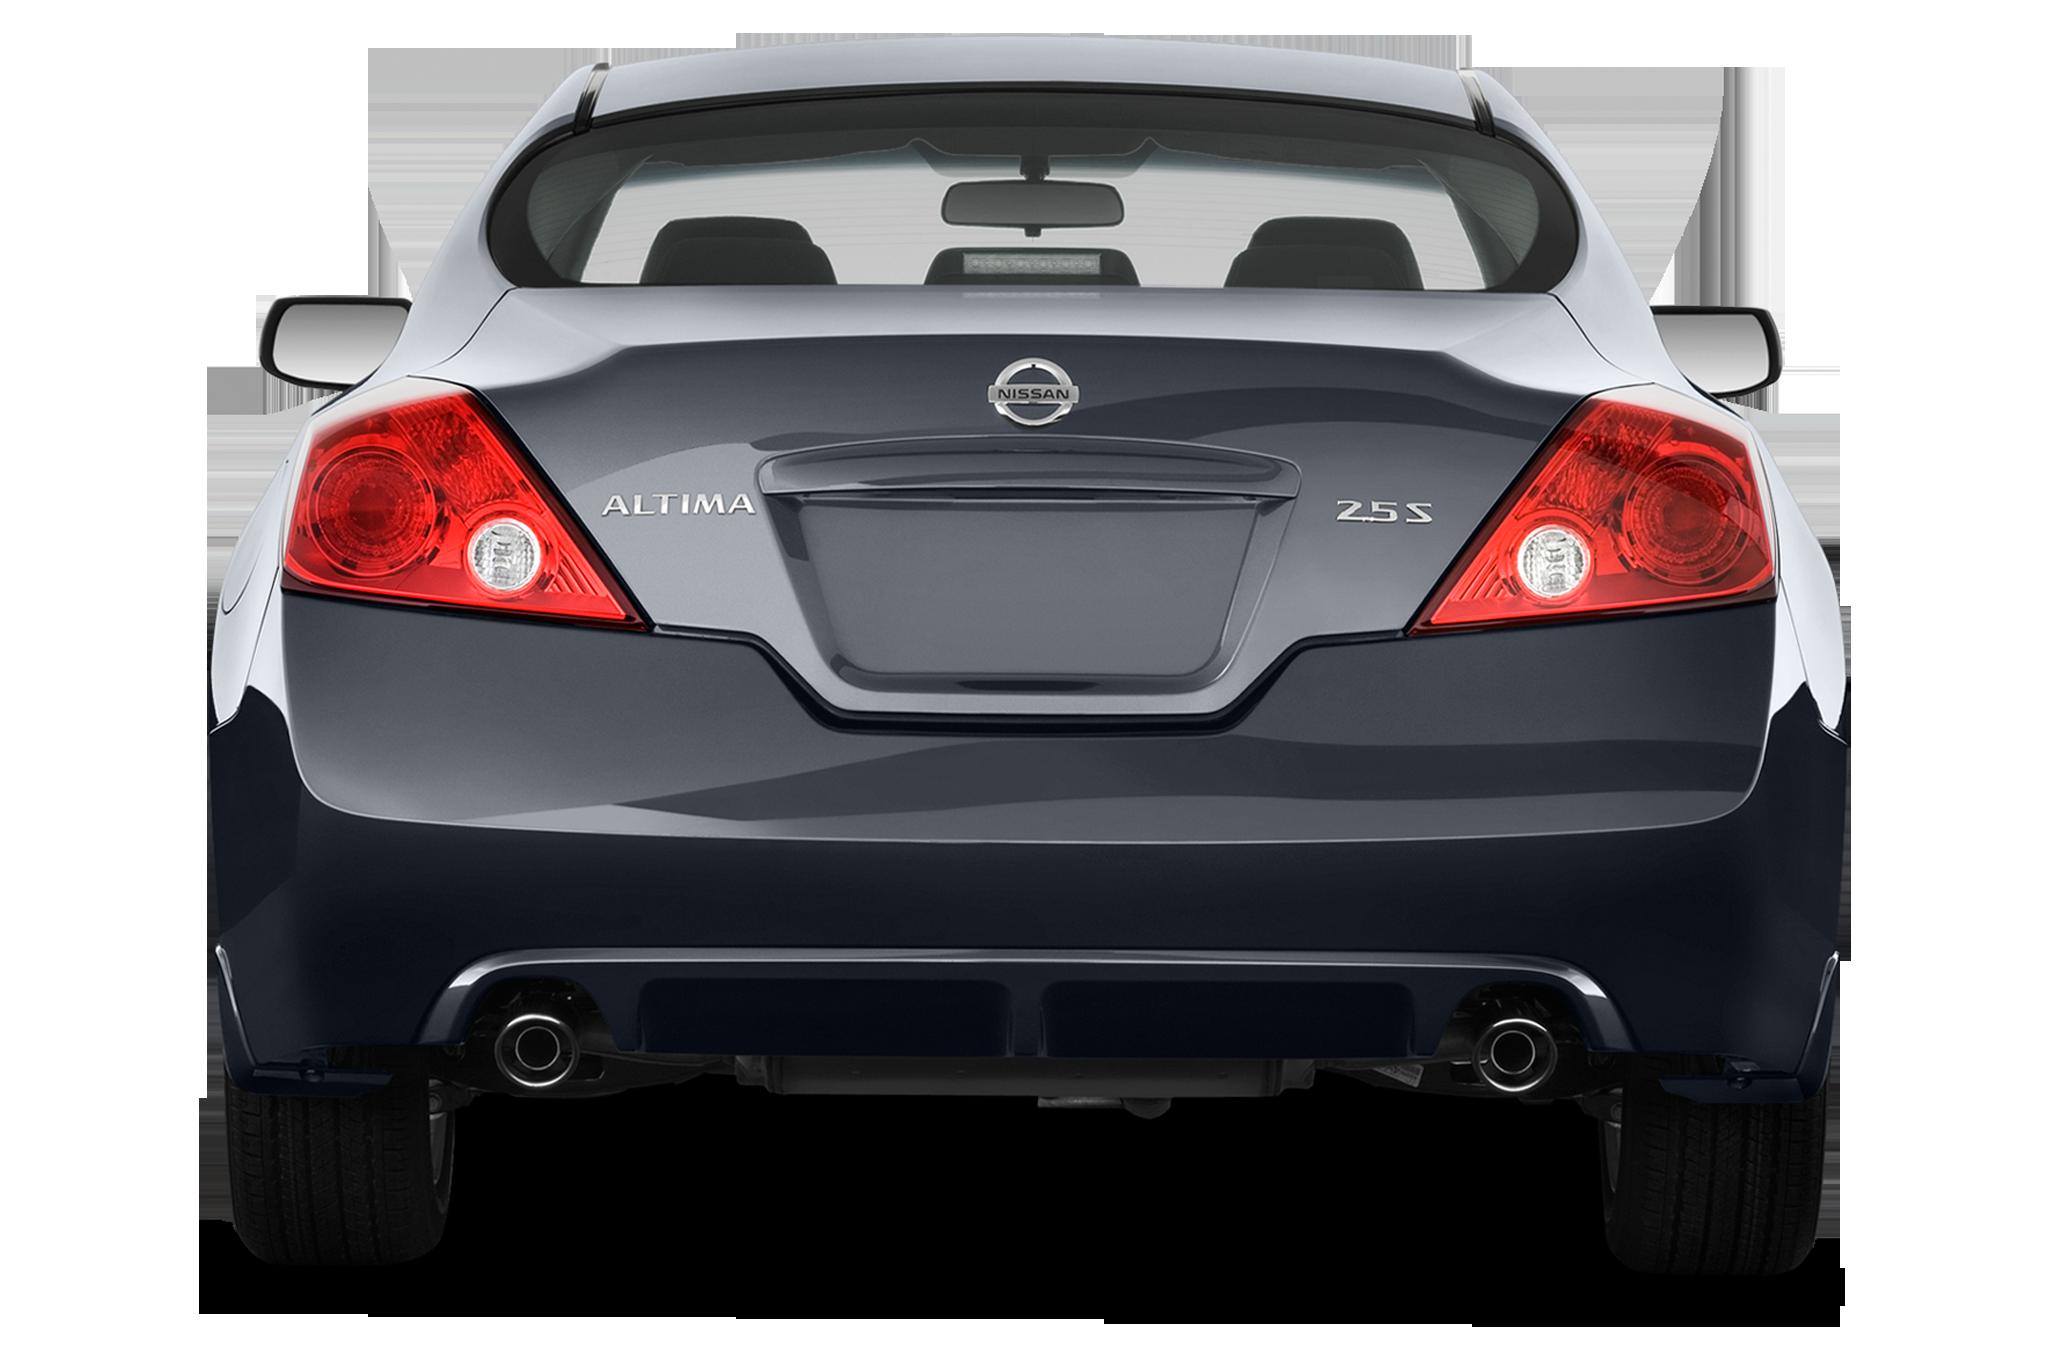 2012 Nissan Altima 2 5S Editors Notebook Automobile Magazine